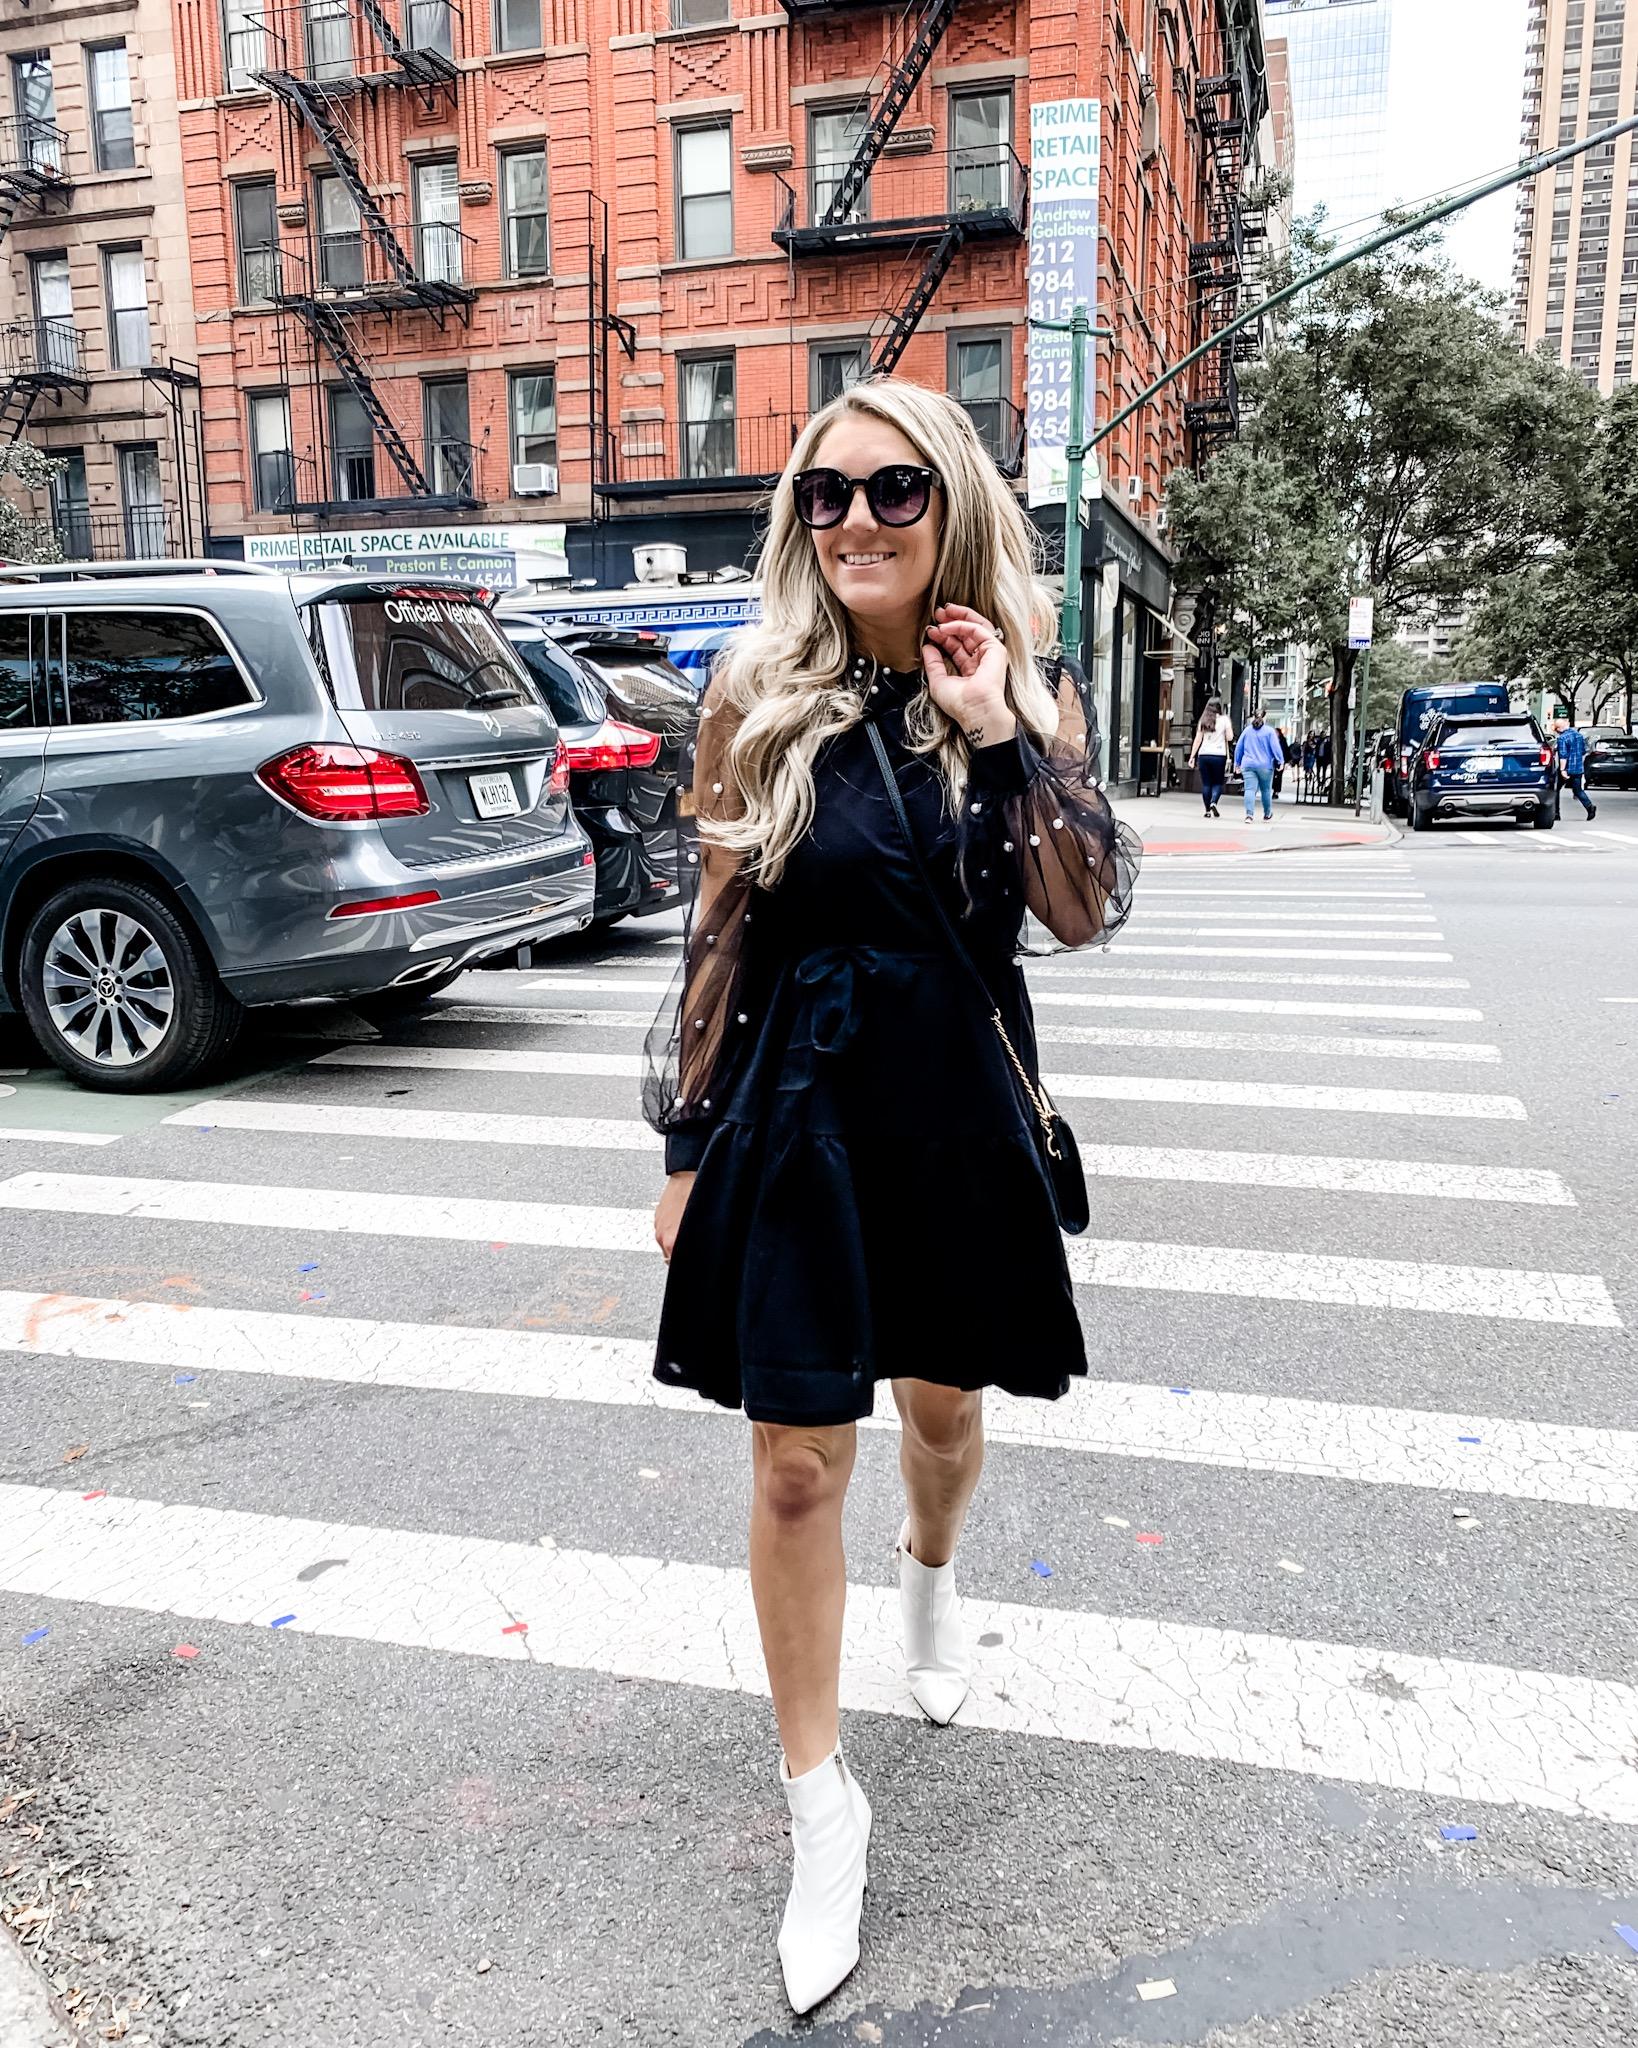 designer dupe sunglasses on amazon